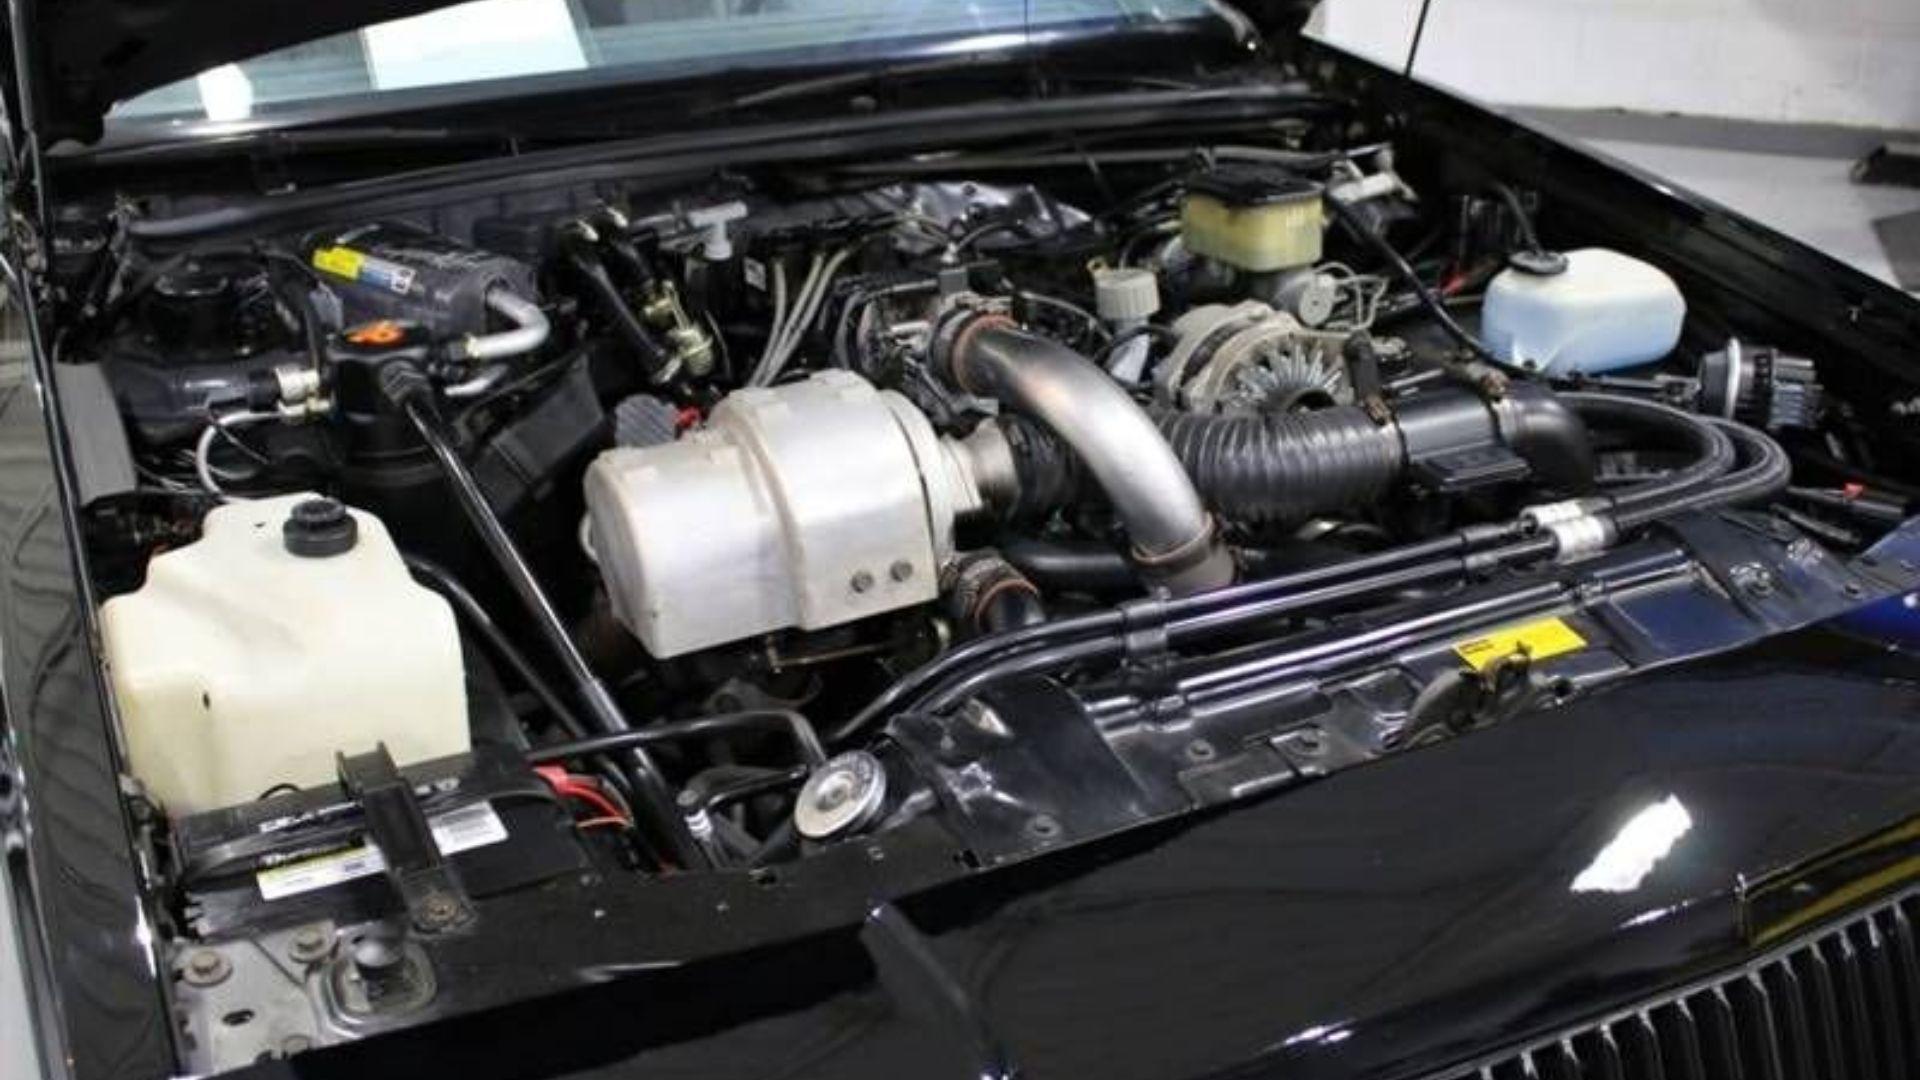 Low-Mileage 1987 Buick Regal Grand National Turbo Promises Fun